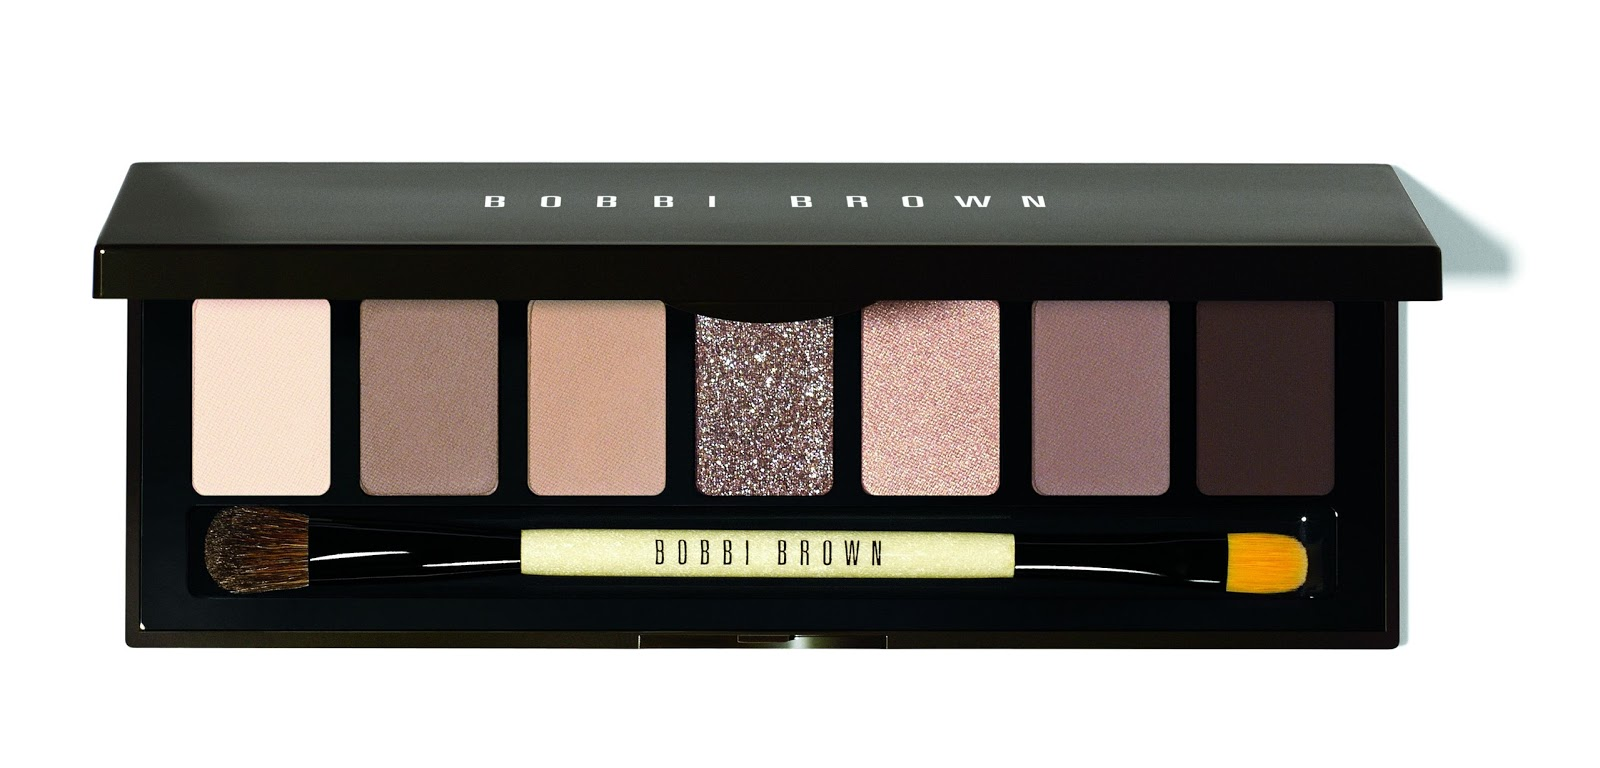 Bobbi Brown Rich Chocolate Eye Palette Limited Edition New